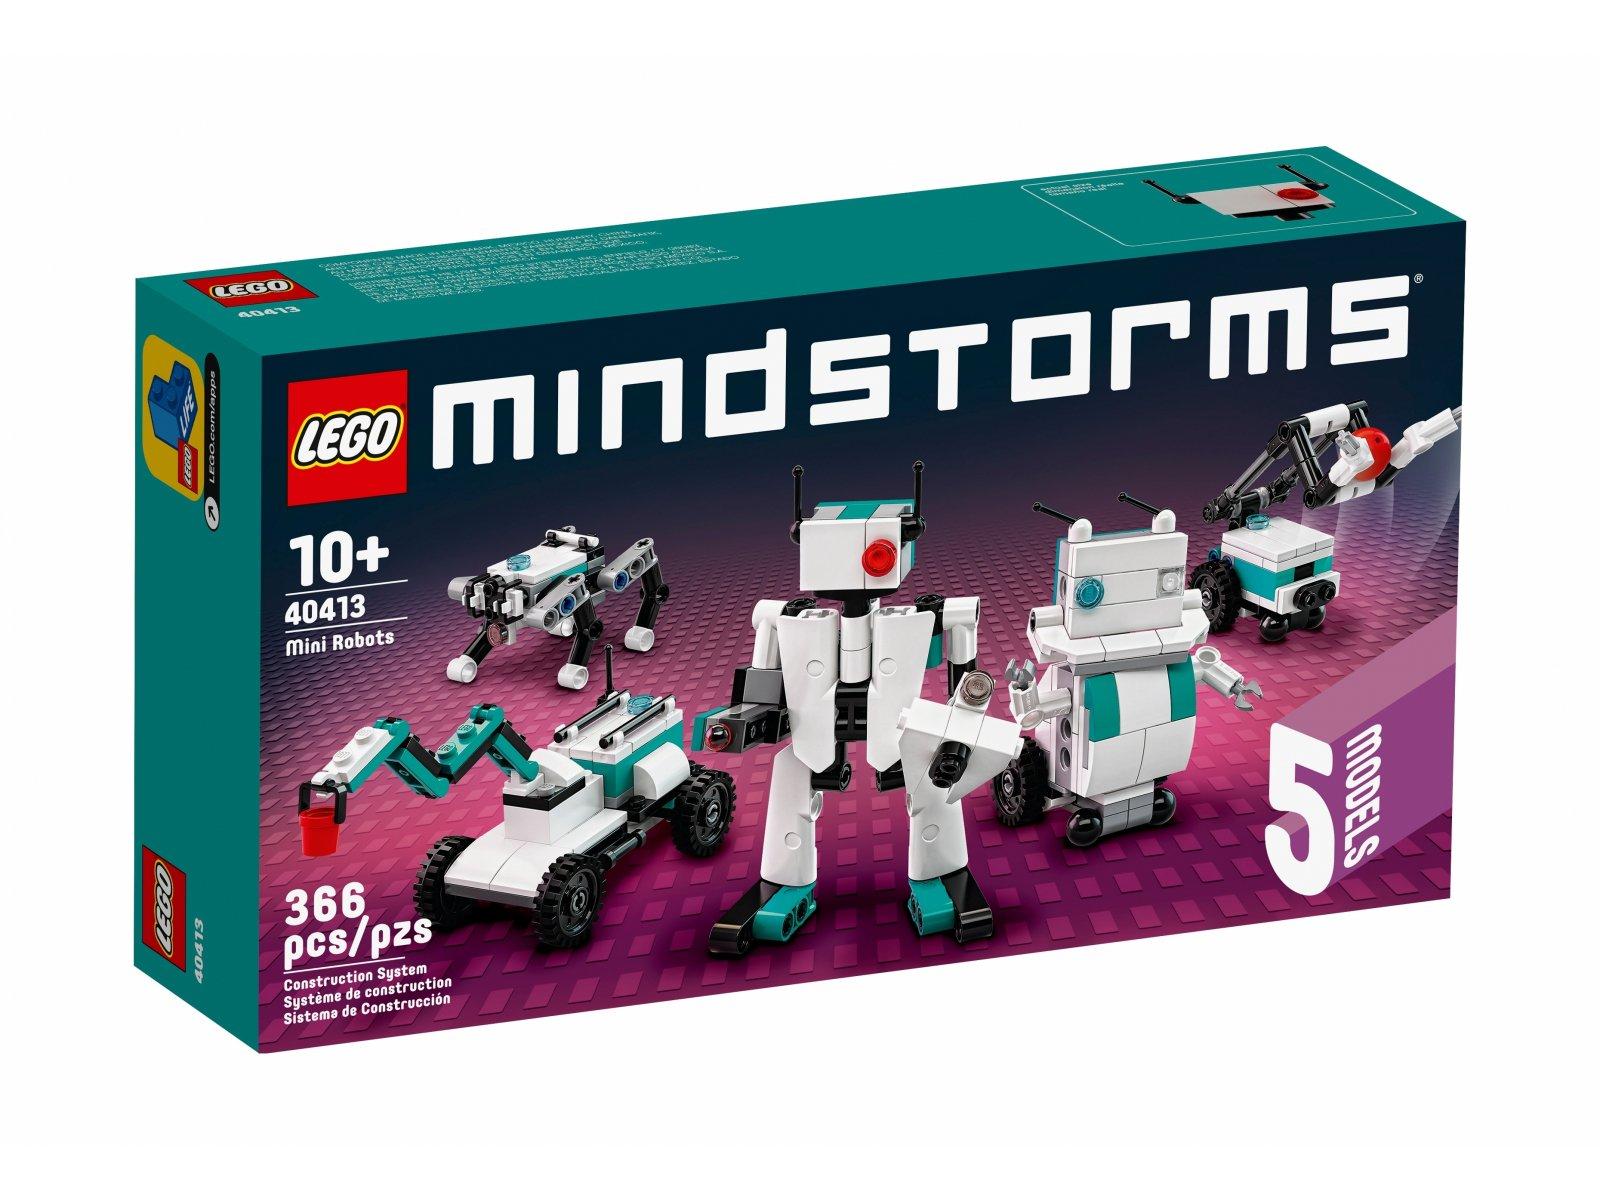 LEGO 40413 Miniroboty